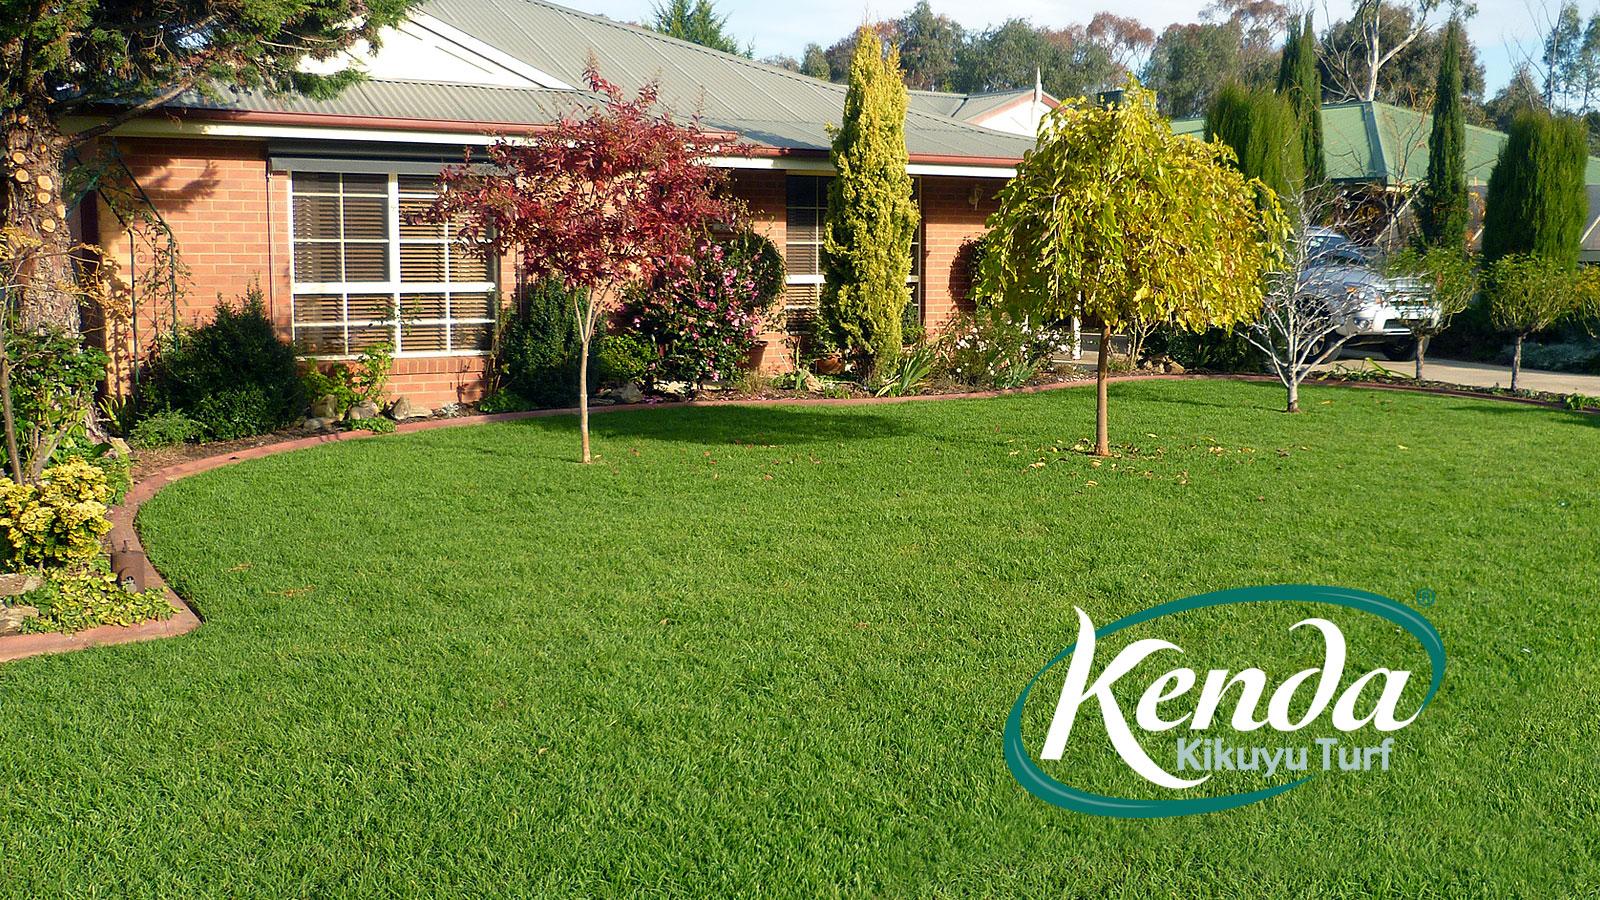 Kenda Kikuyu - Drought Tolerant Lawn Variety